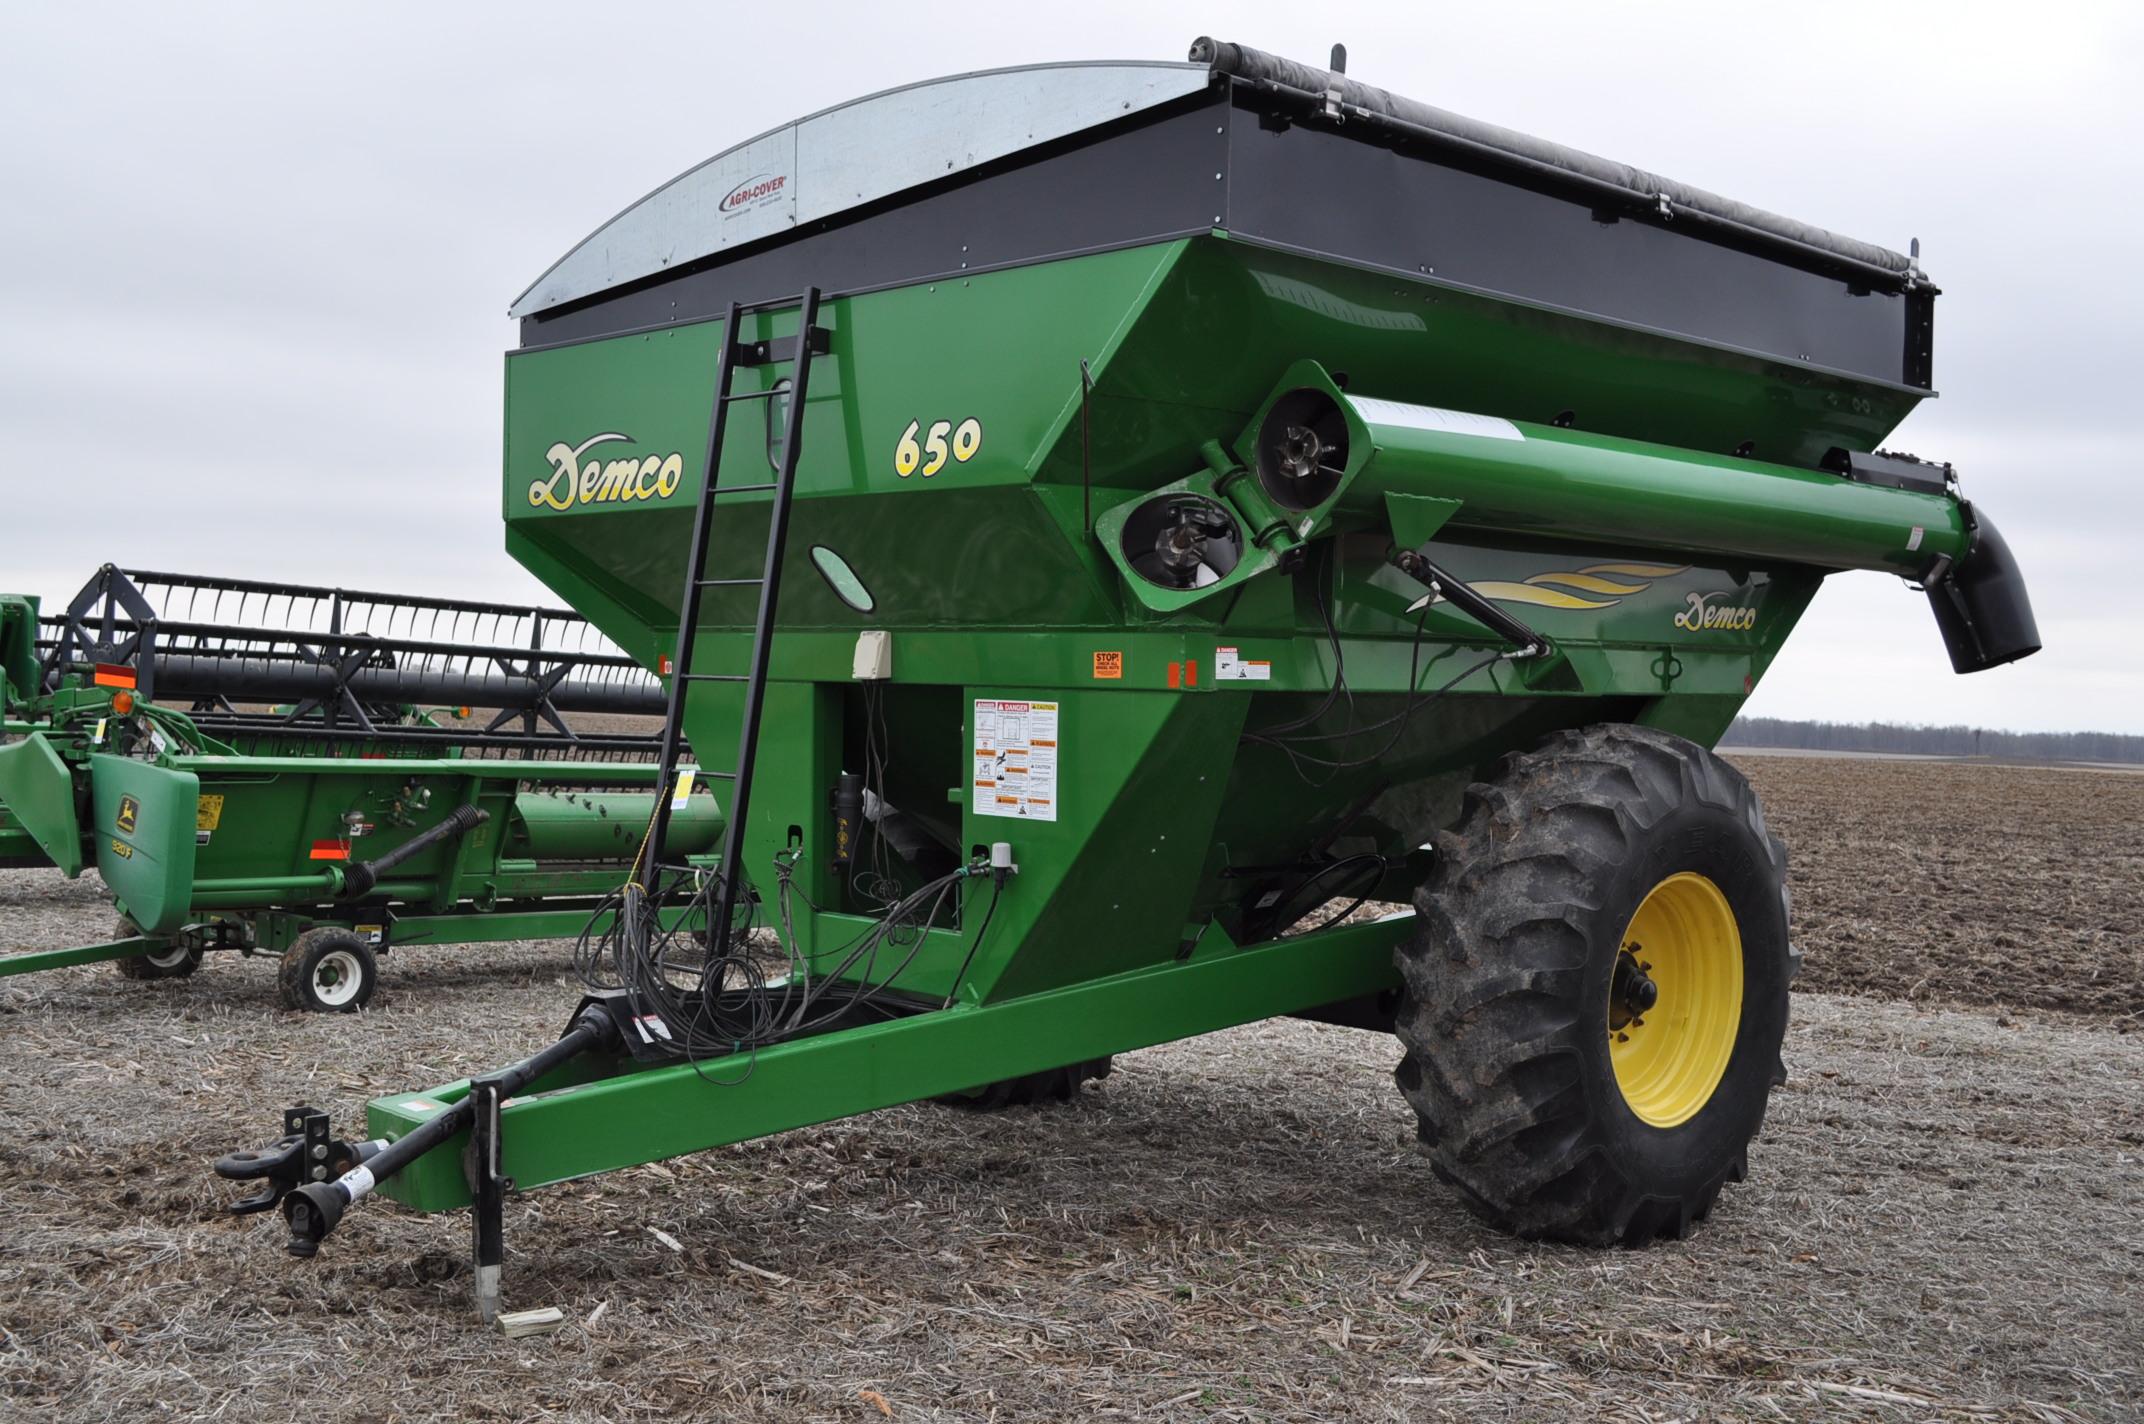 Demco 650 grain cart, 24.5-32 tires, roll tarp, hyd swing spout, Digistar scales, corner auger, rear